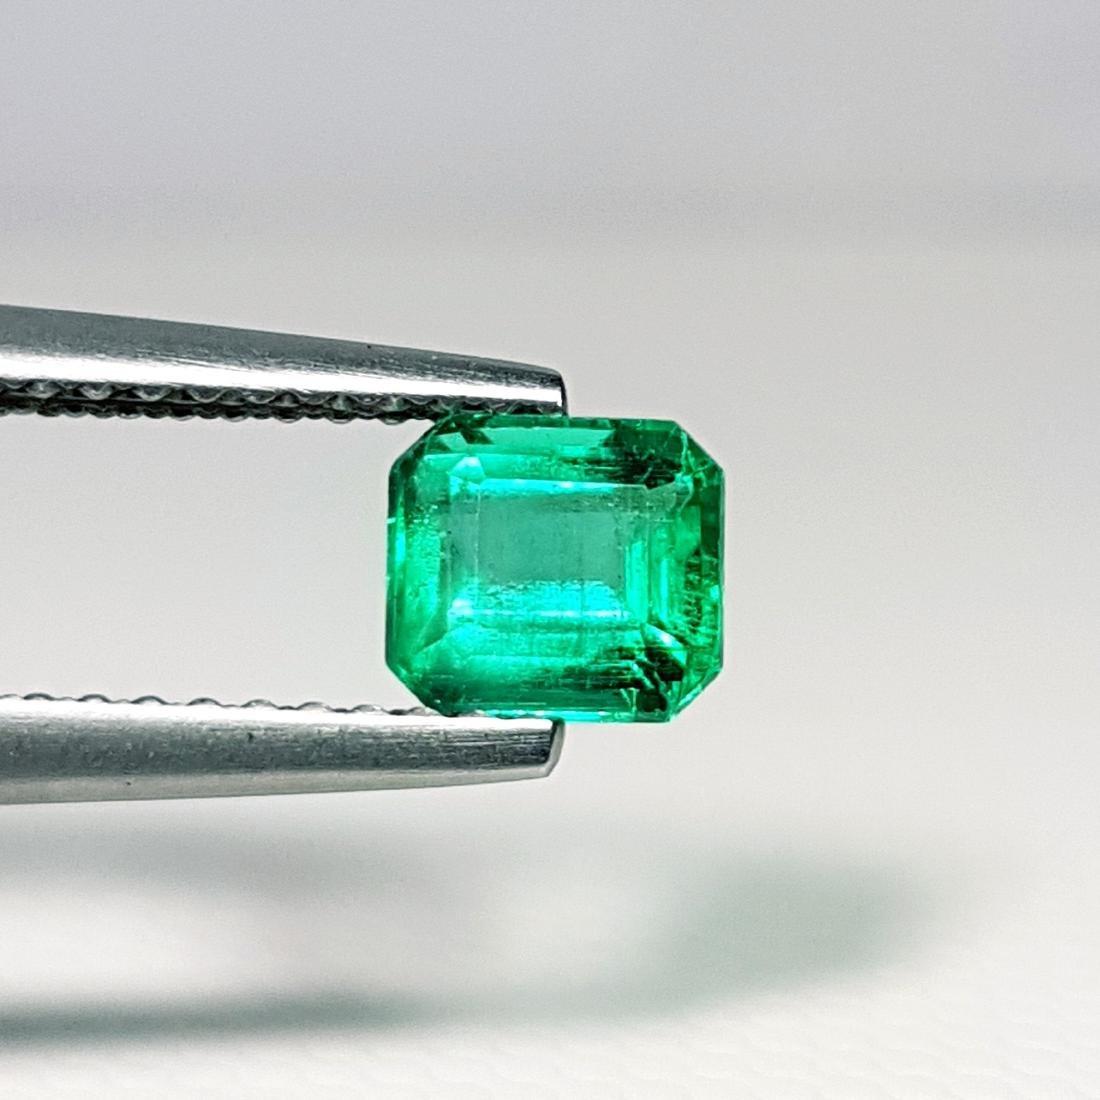 Top Qaulity Emerald Cut NaturalEmerald - 0.63 ct